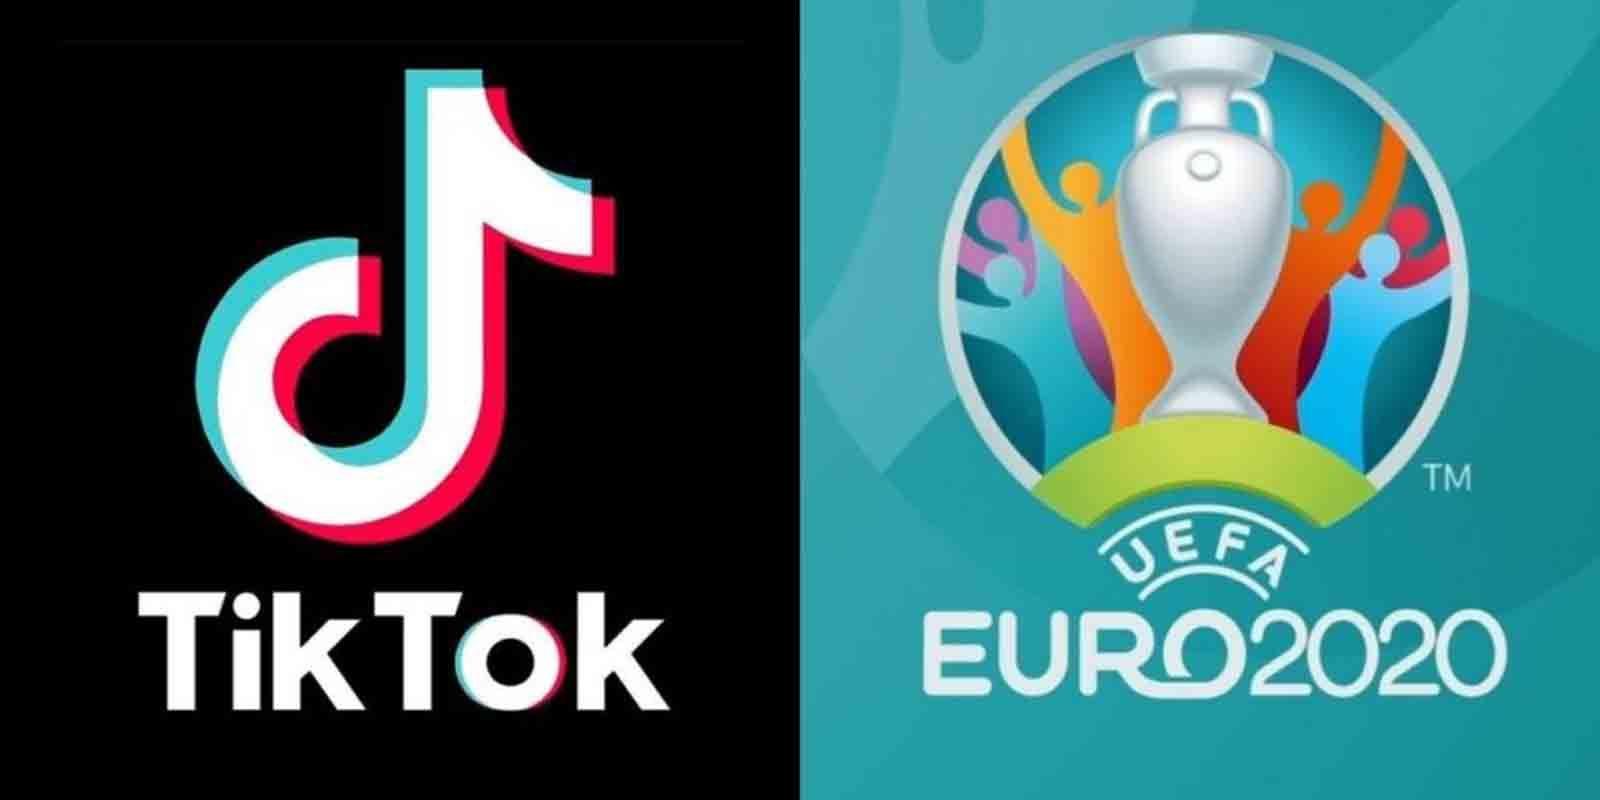 Eurocopa TikTok contenido exclusivo